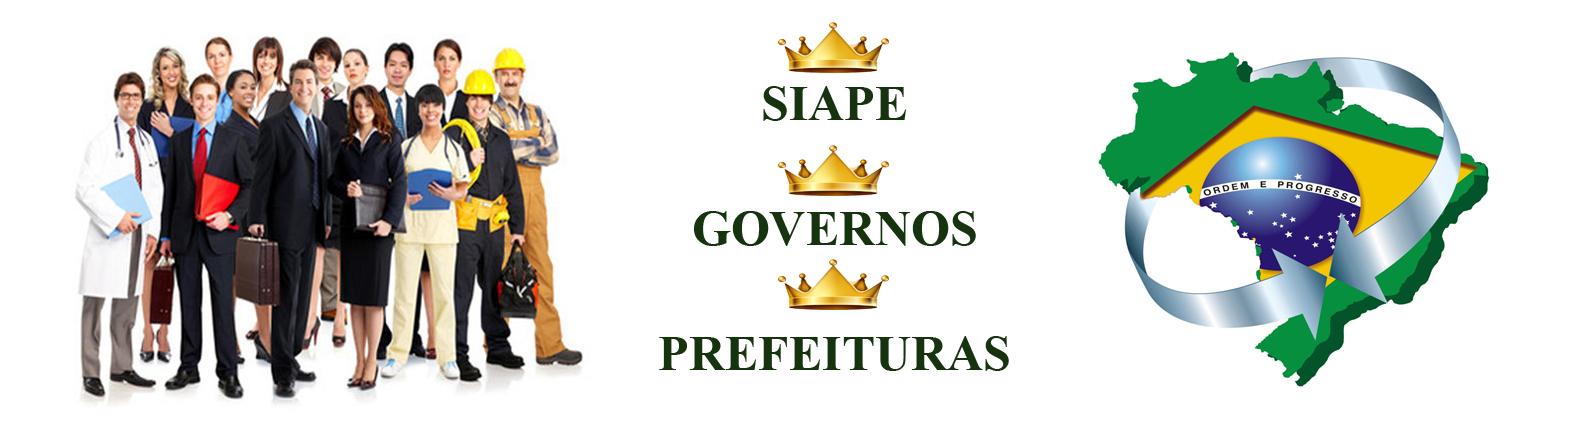 BANNER-EMPRESTIMOS-GOV-PREF-SIAP